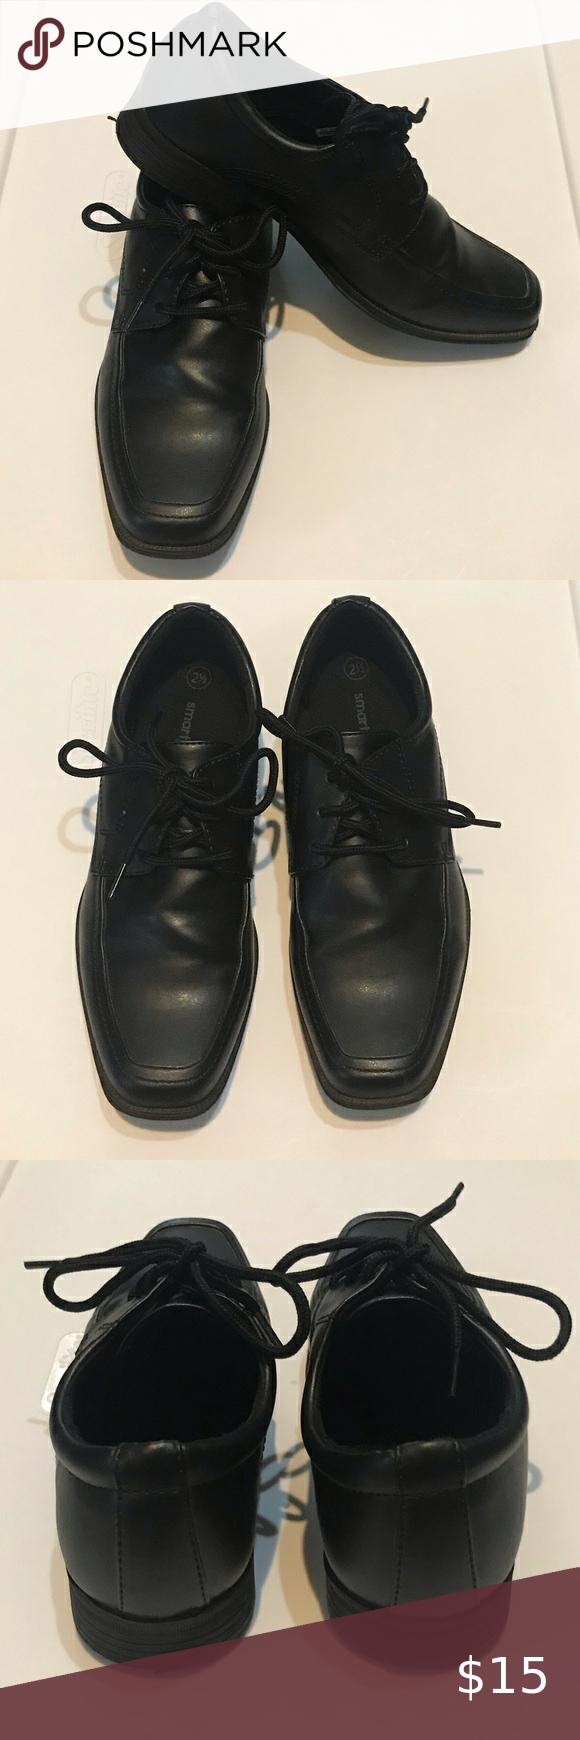 🌸3/$10🌸Boys Dress Shoes in 2020 | Boys